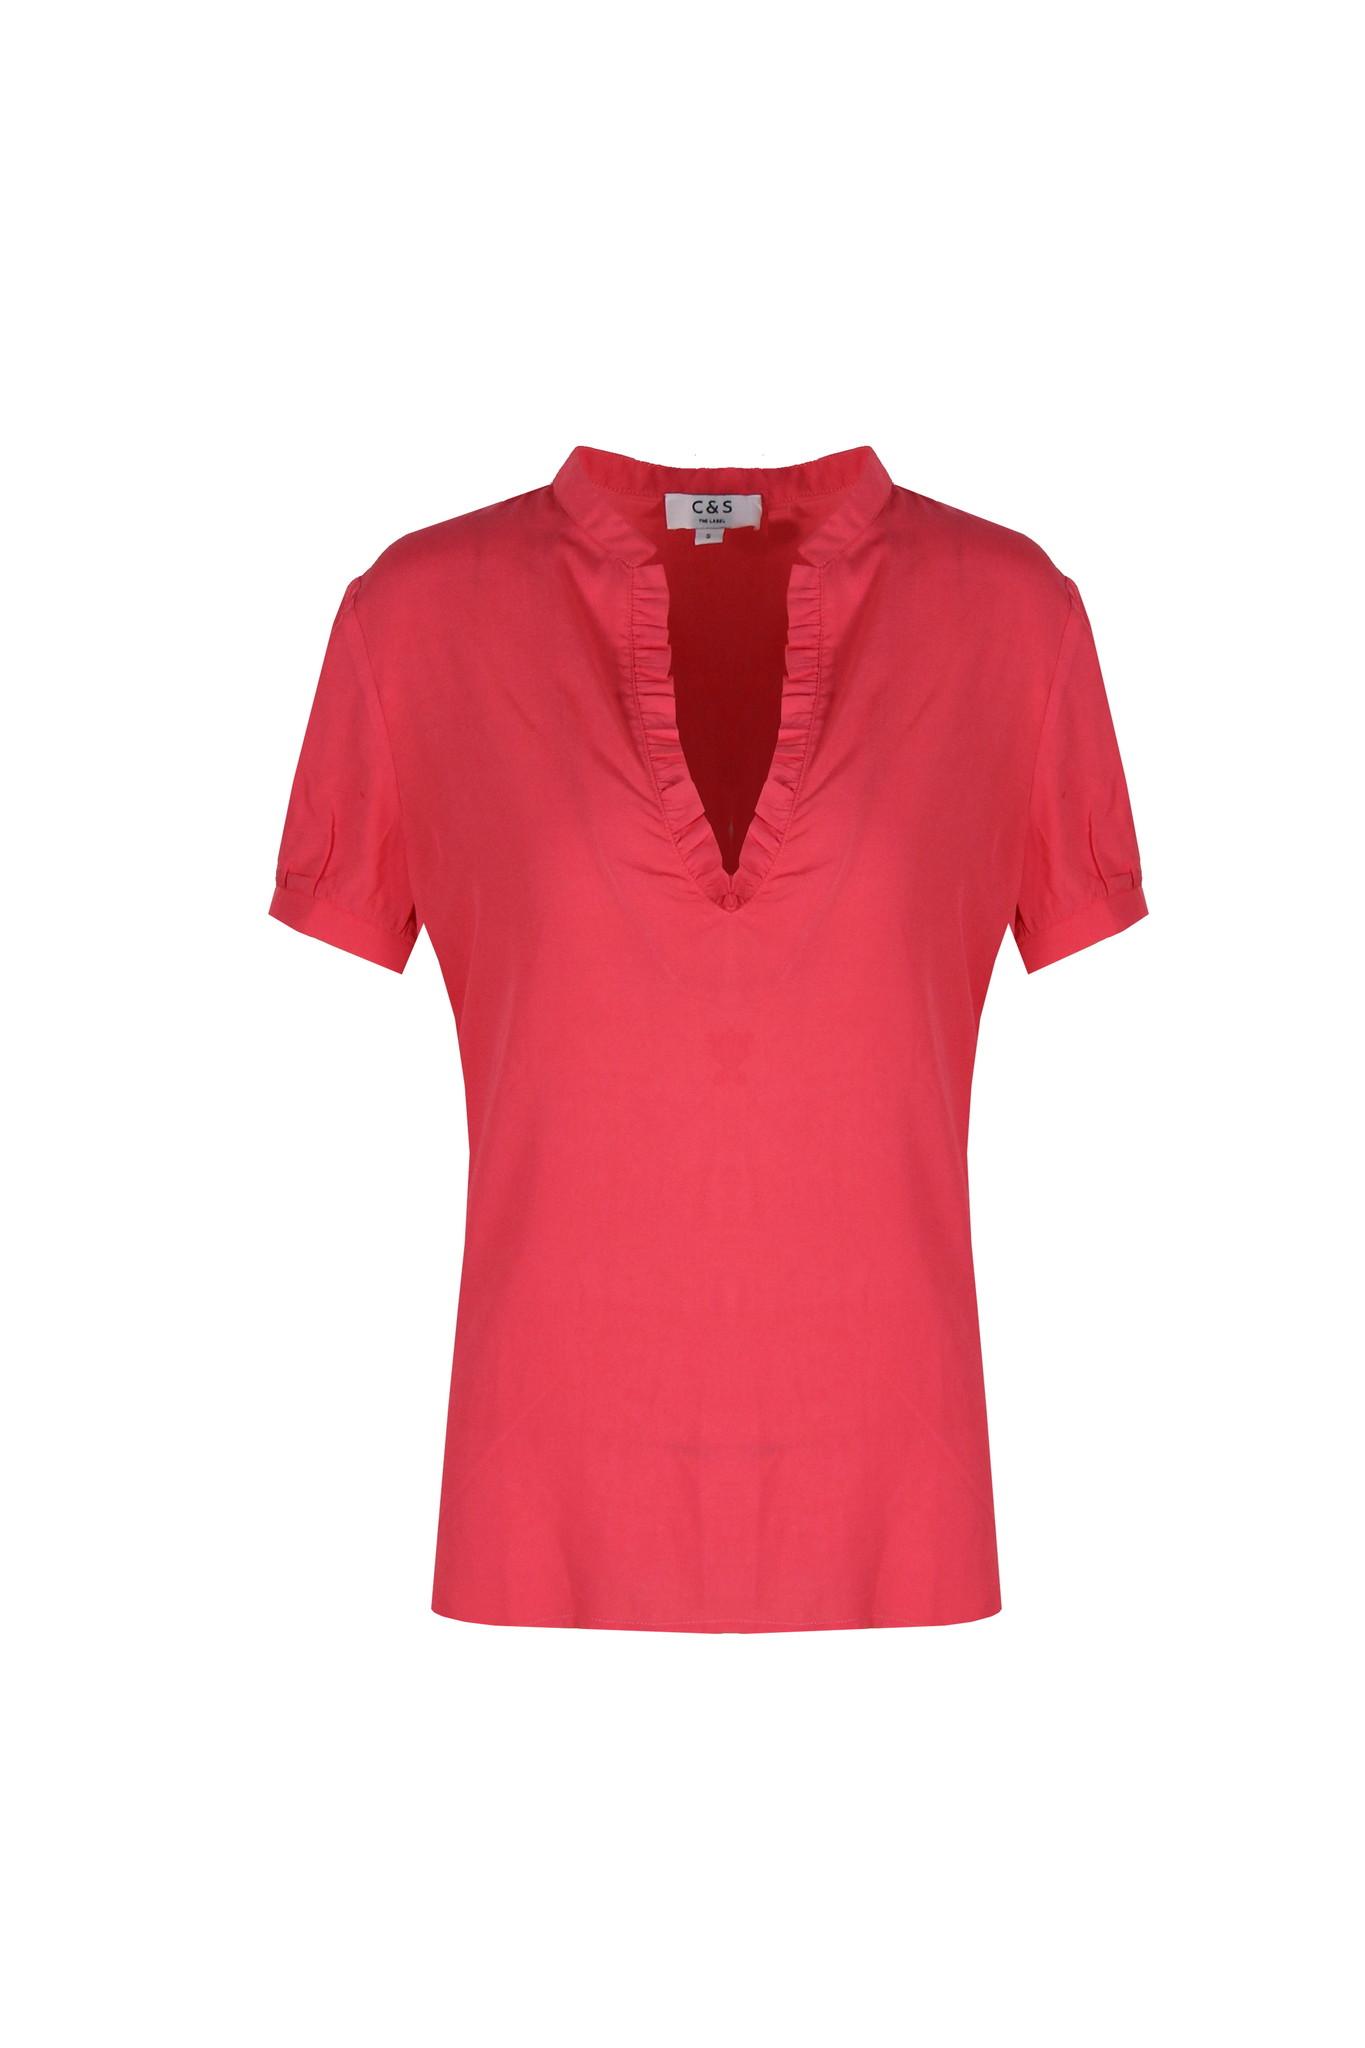 C&S The label C&S The label blouse Marjet rood